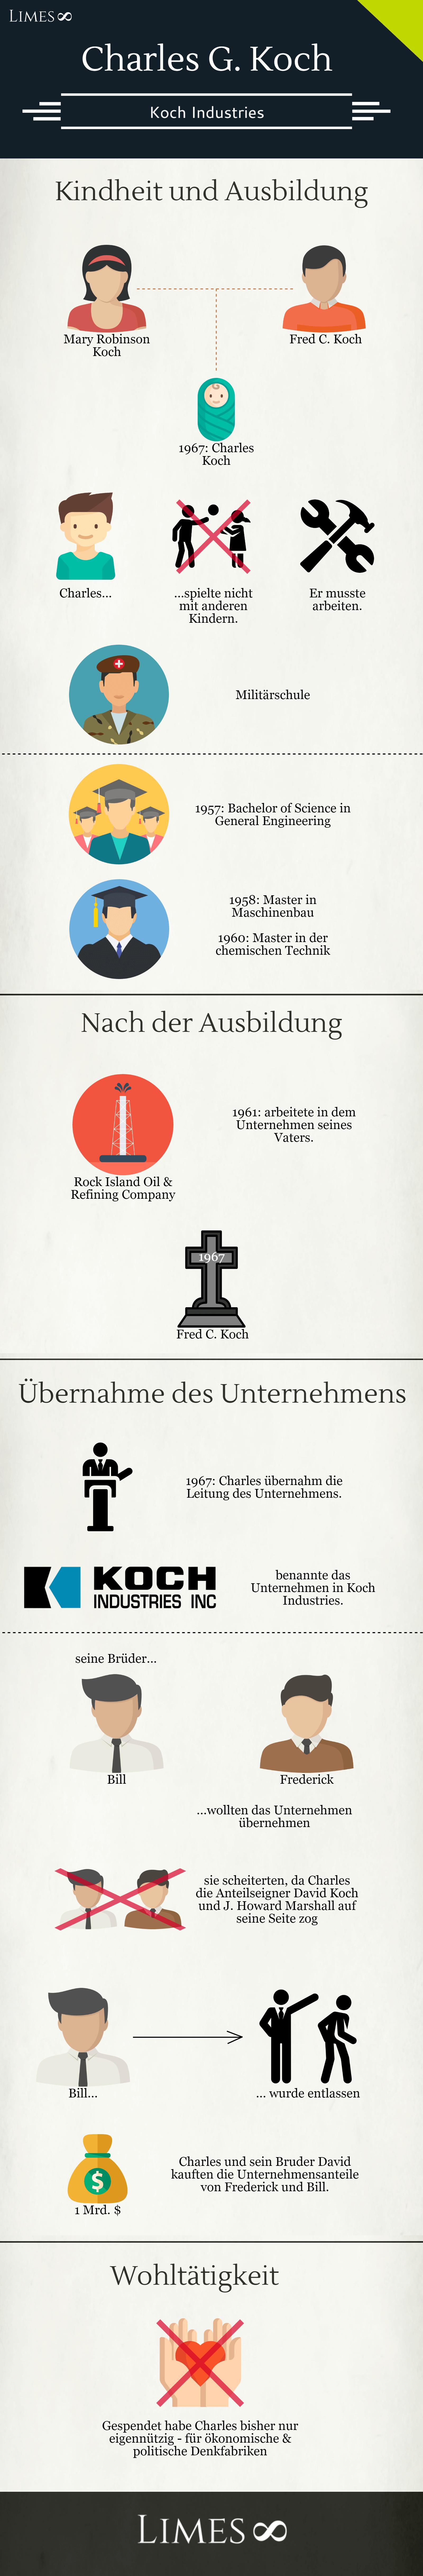 Infografik über Charles Koch